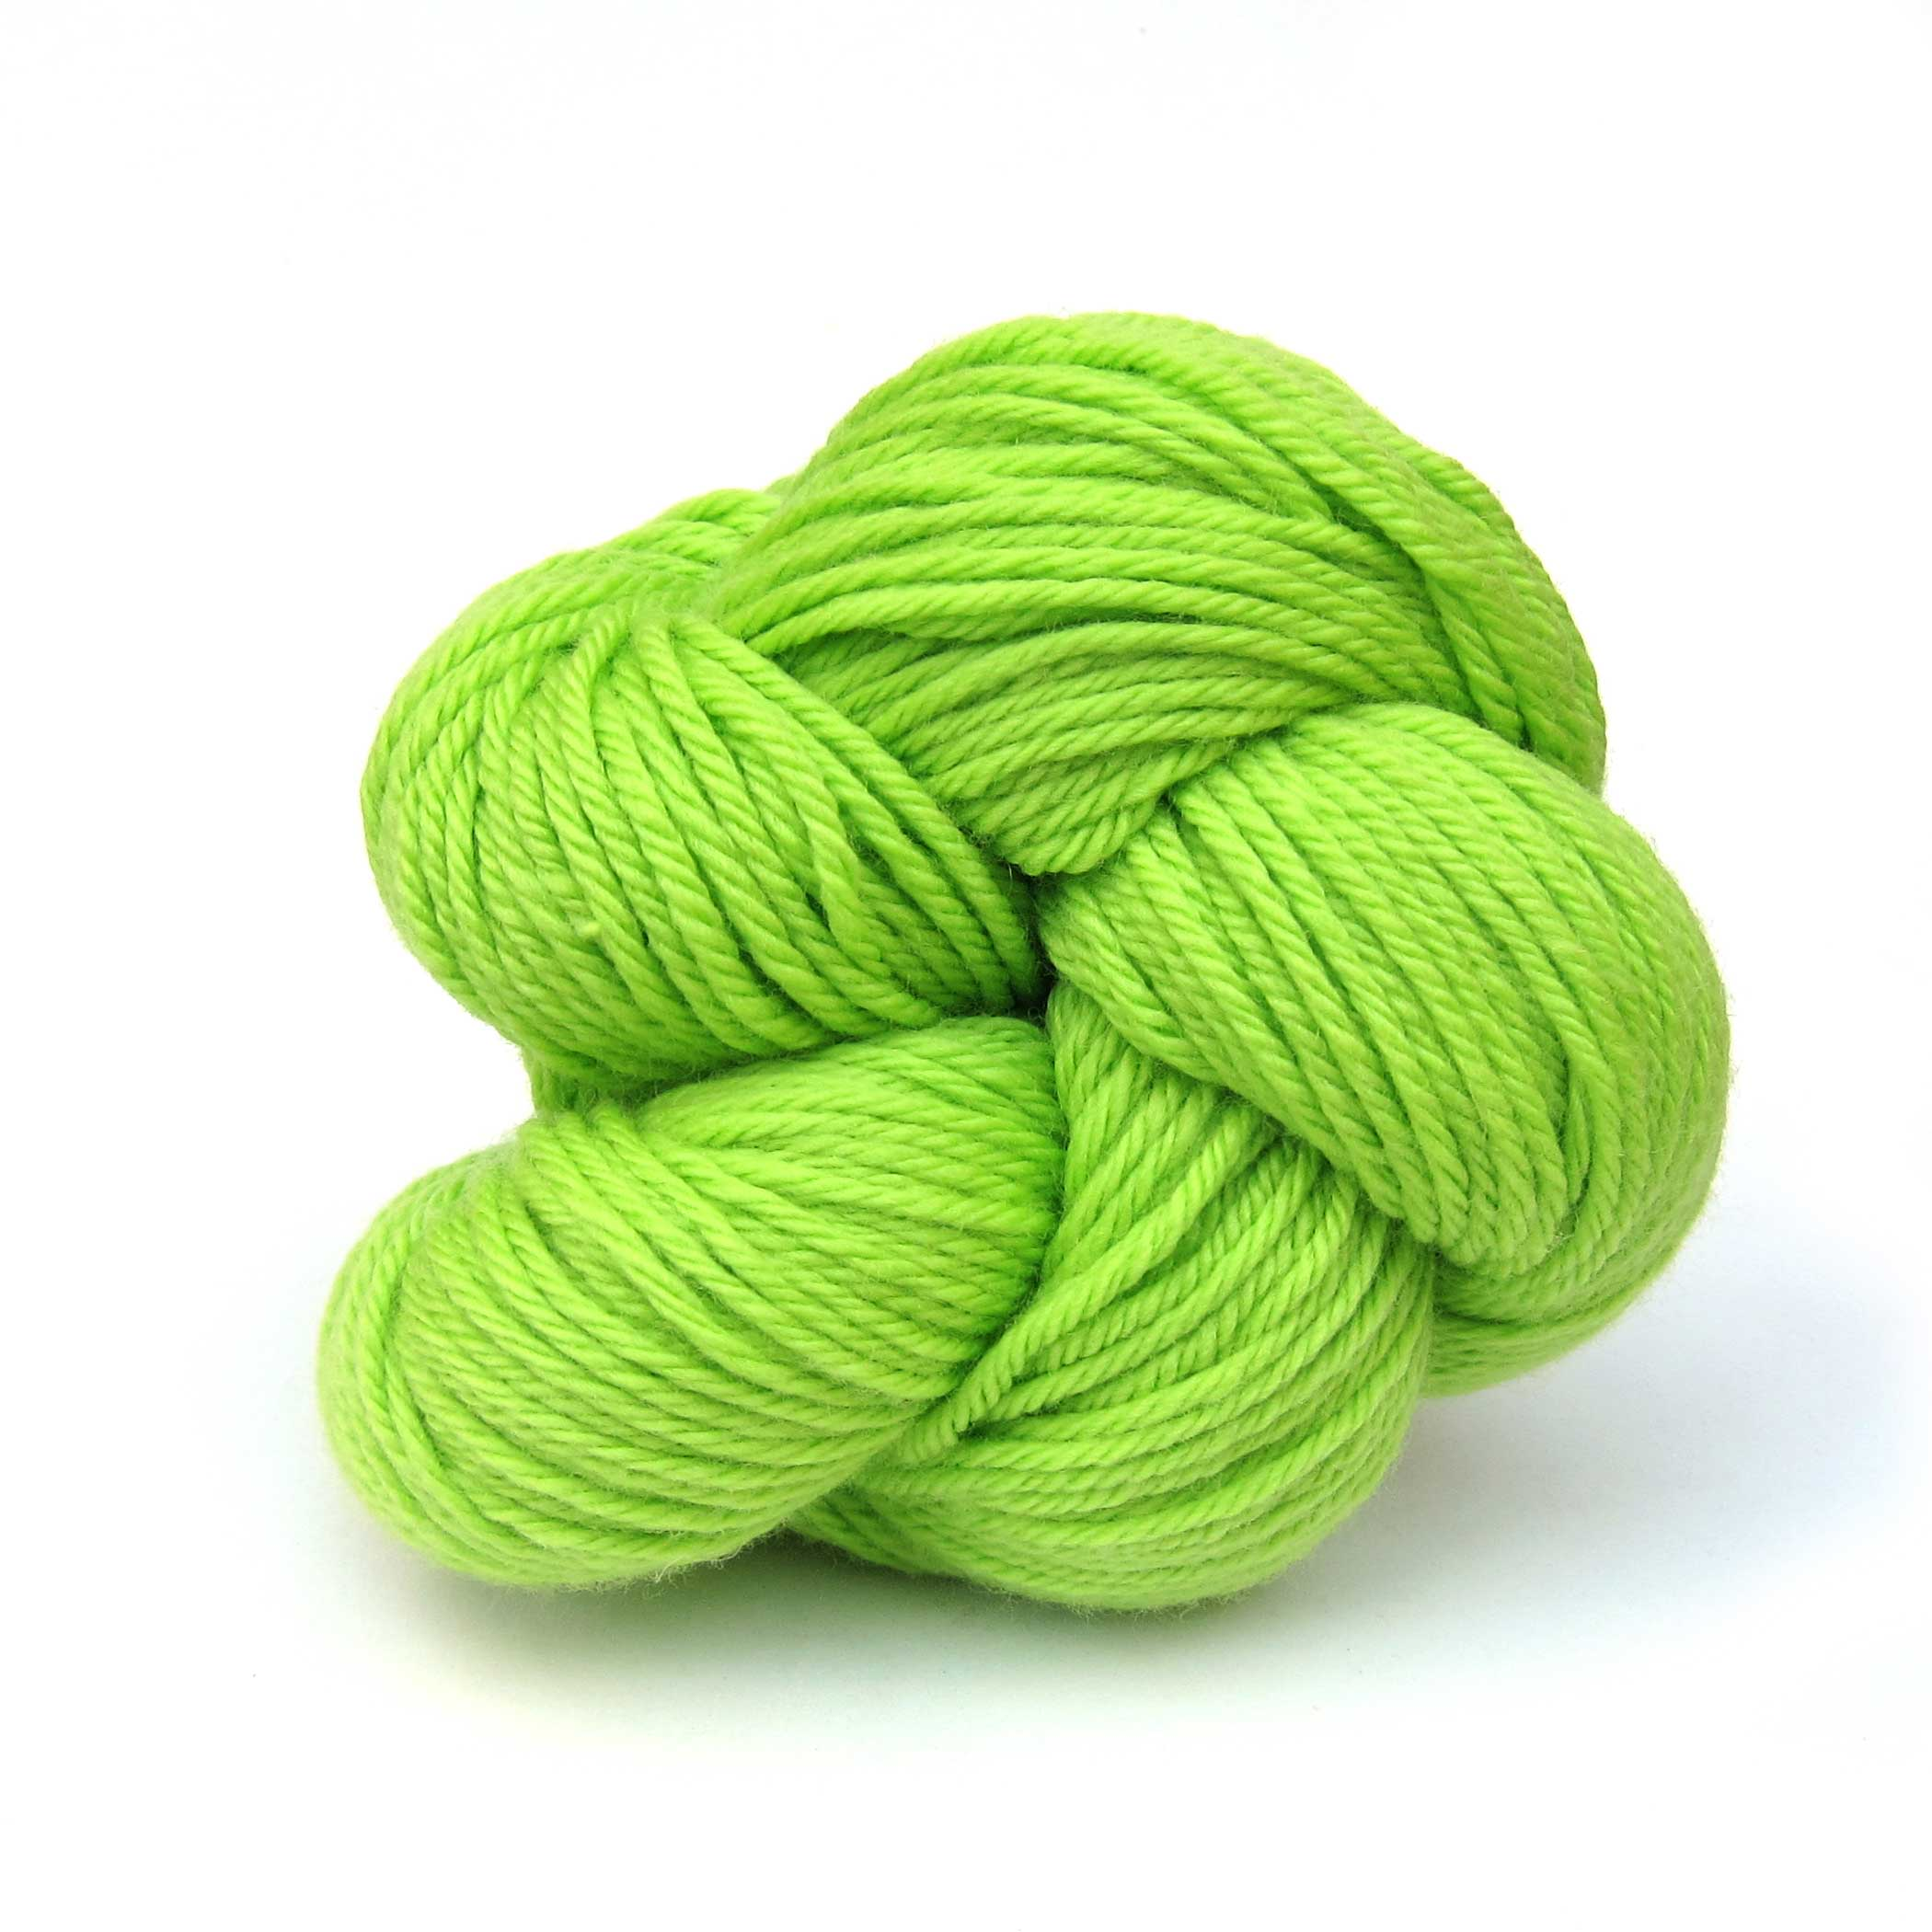 Lime Louet Gems 100% Merino Superwash Yarn